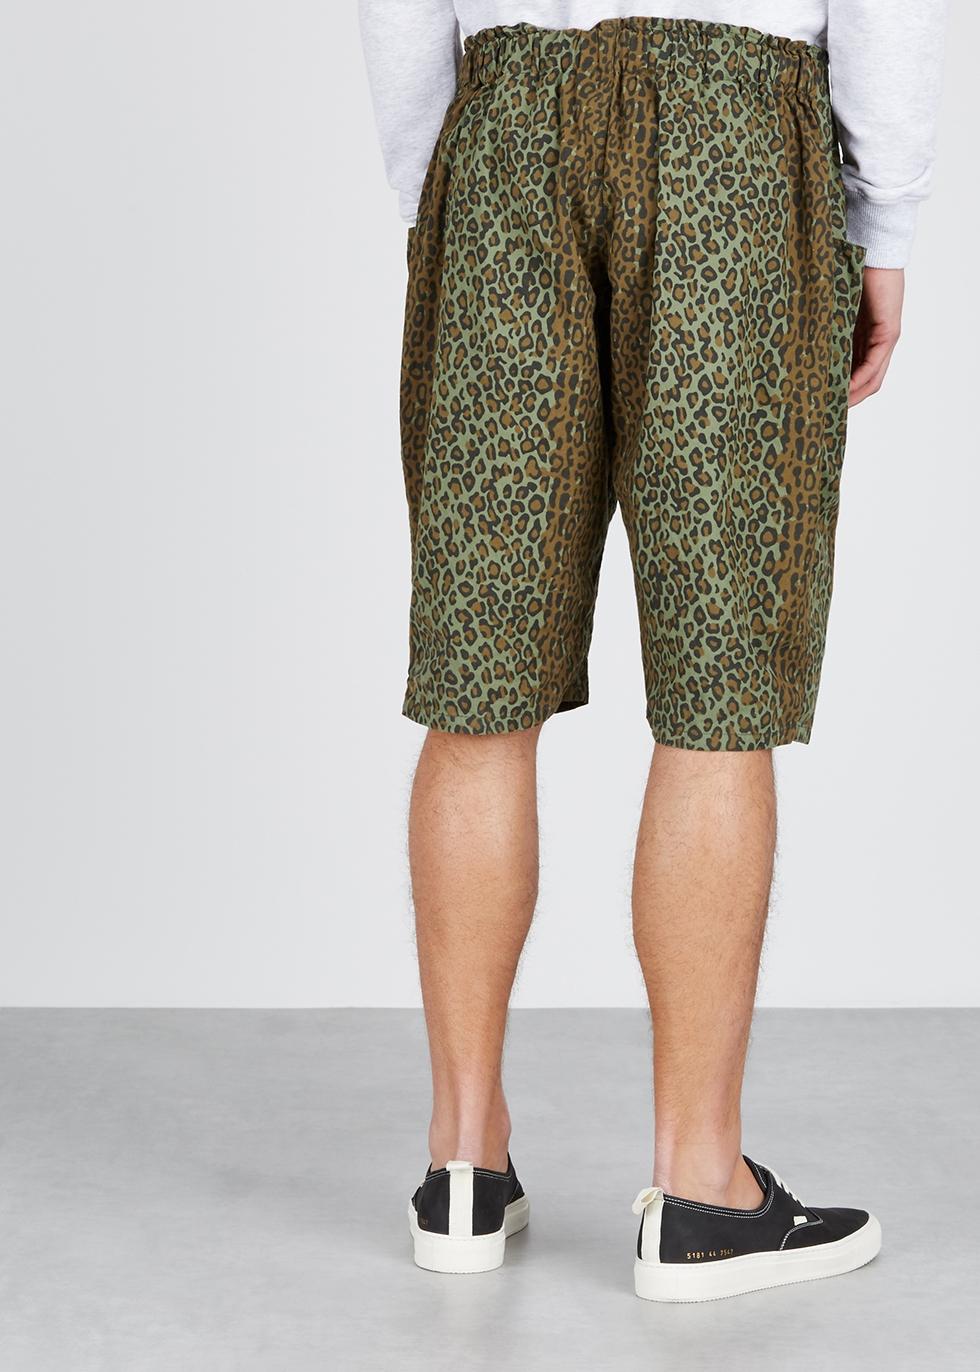 Sitting leopard-print cotton shorts - South2 West8